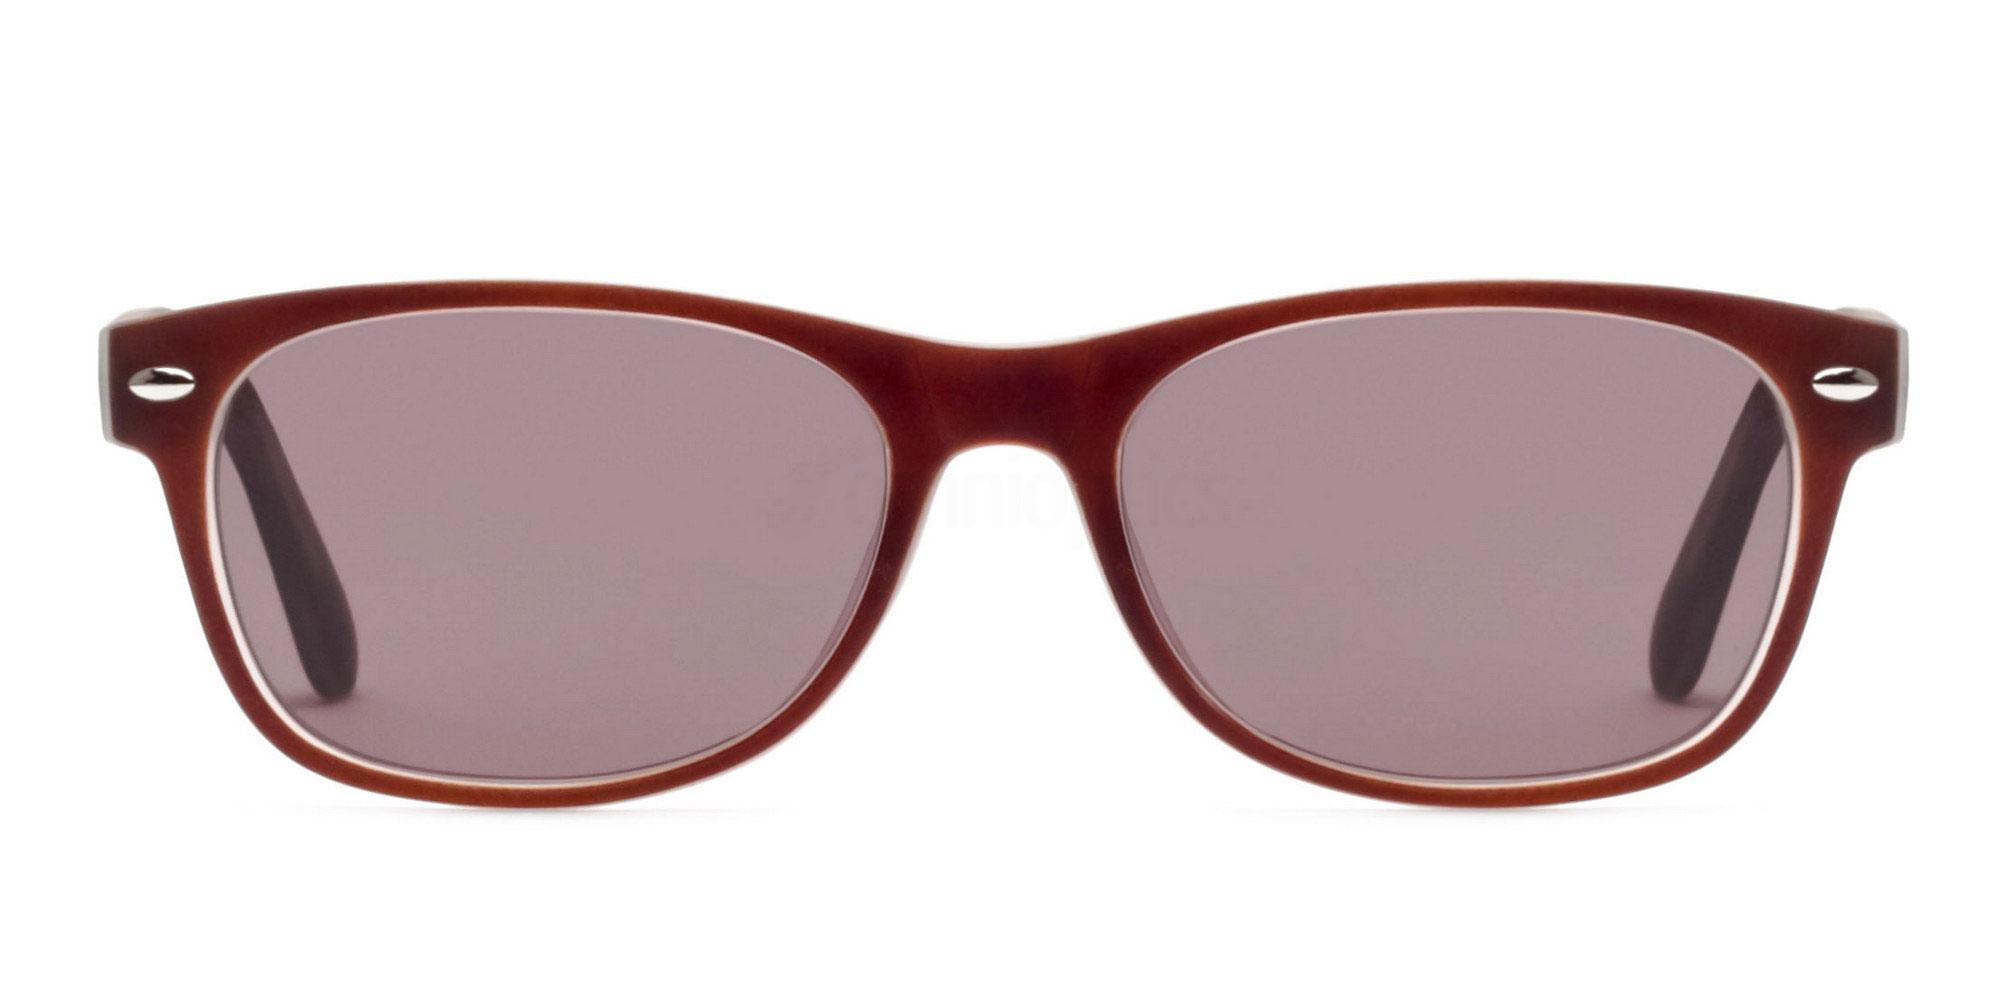 Brown S8122 - Brown (Sunglasses) , Savannah